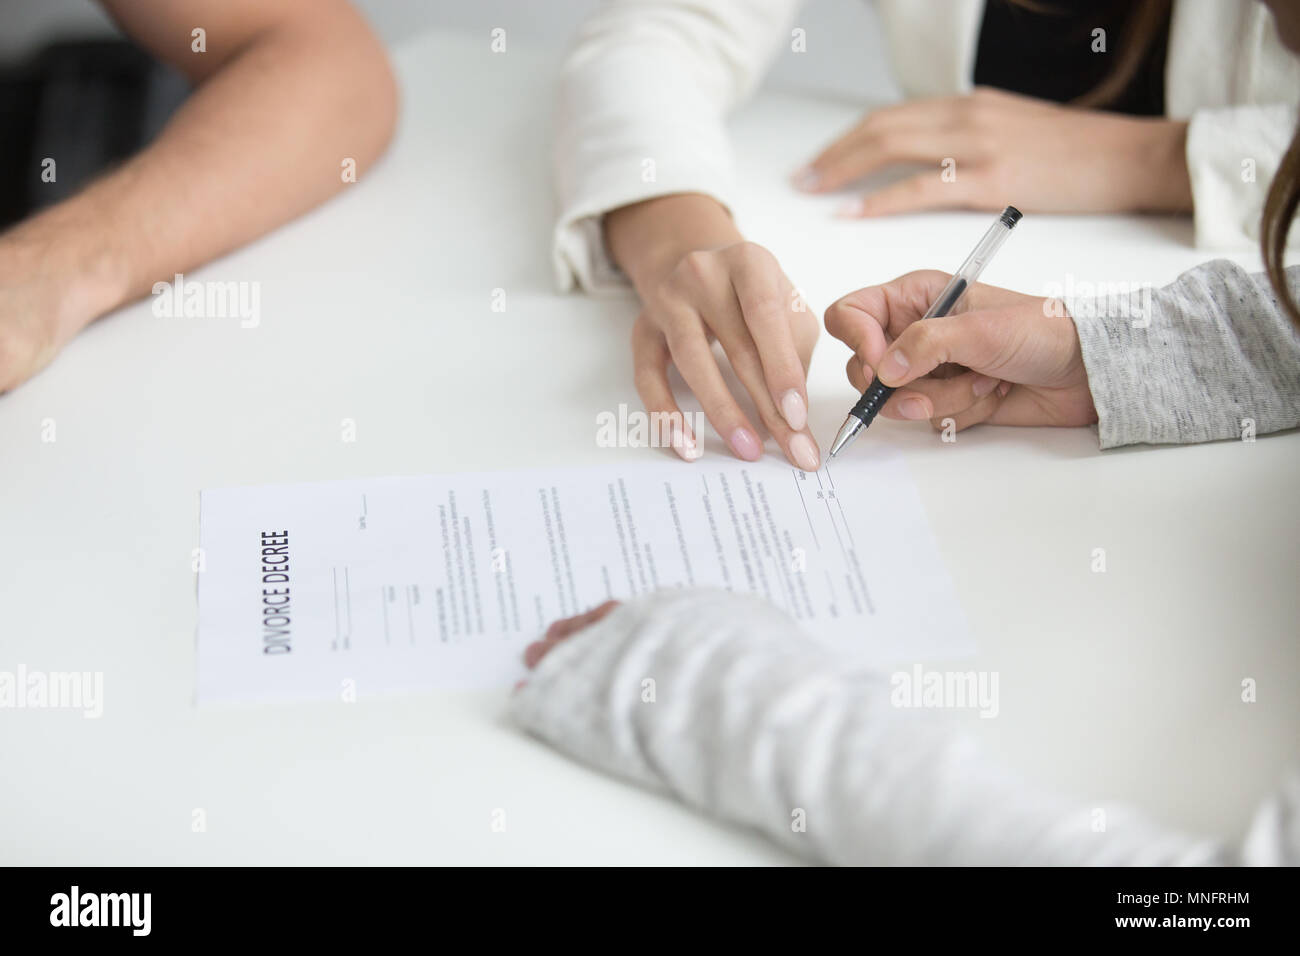 Wife signing divorce decree after break up decision - Stock Image